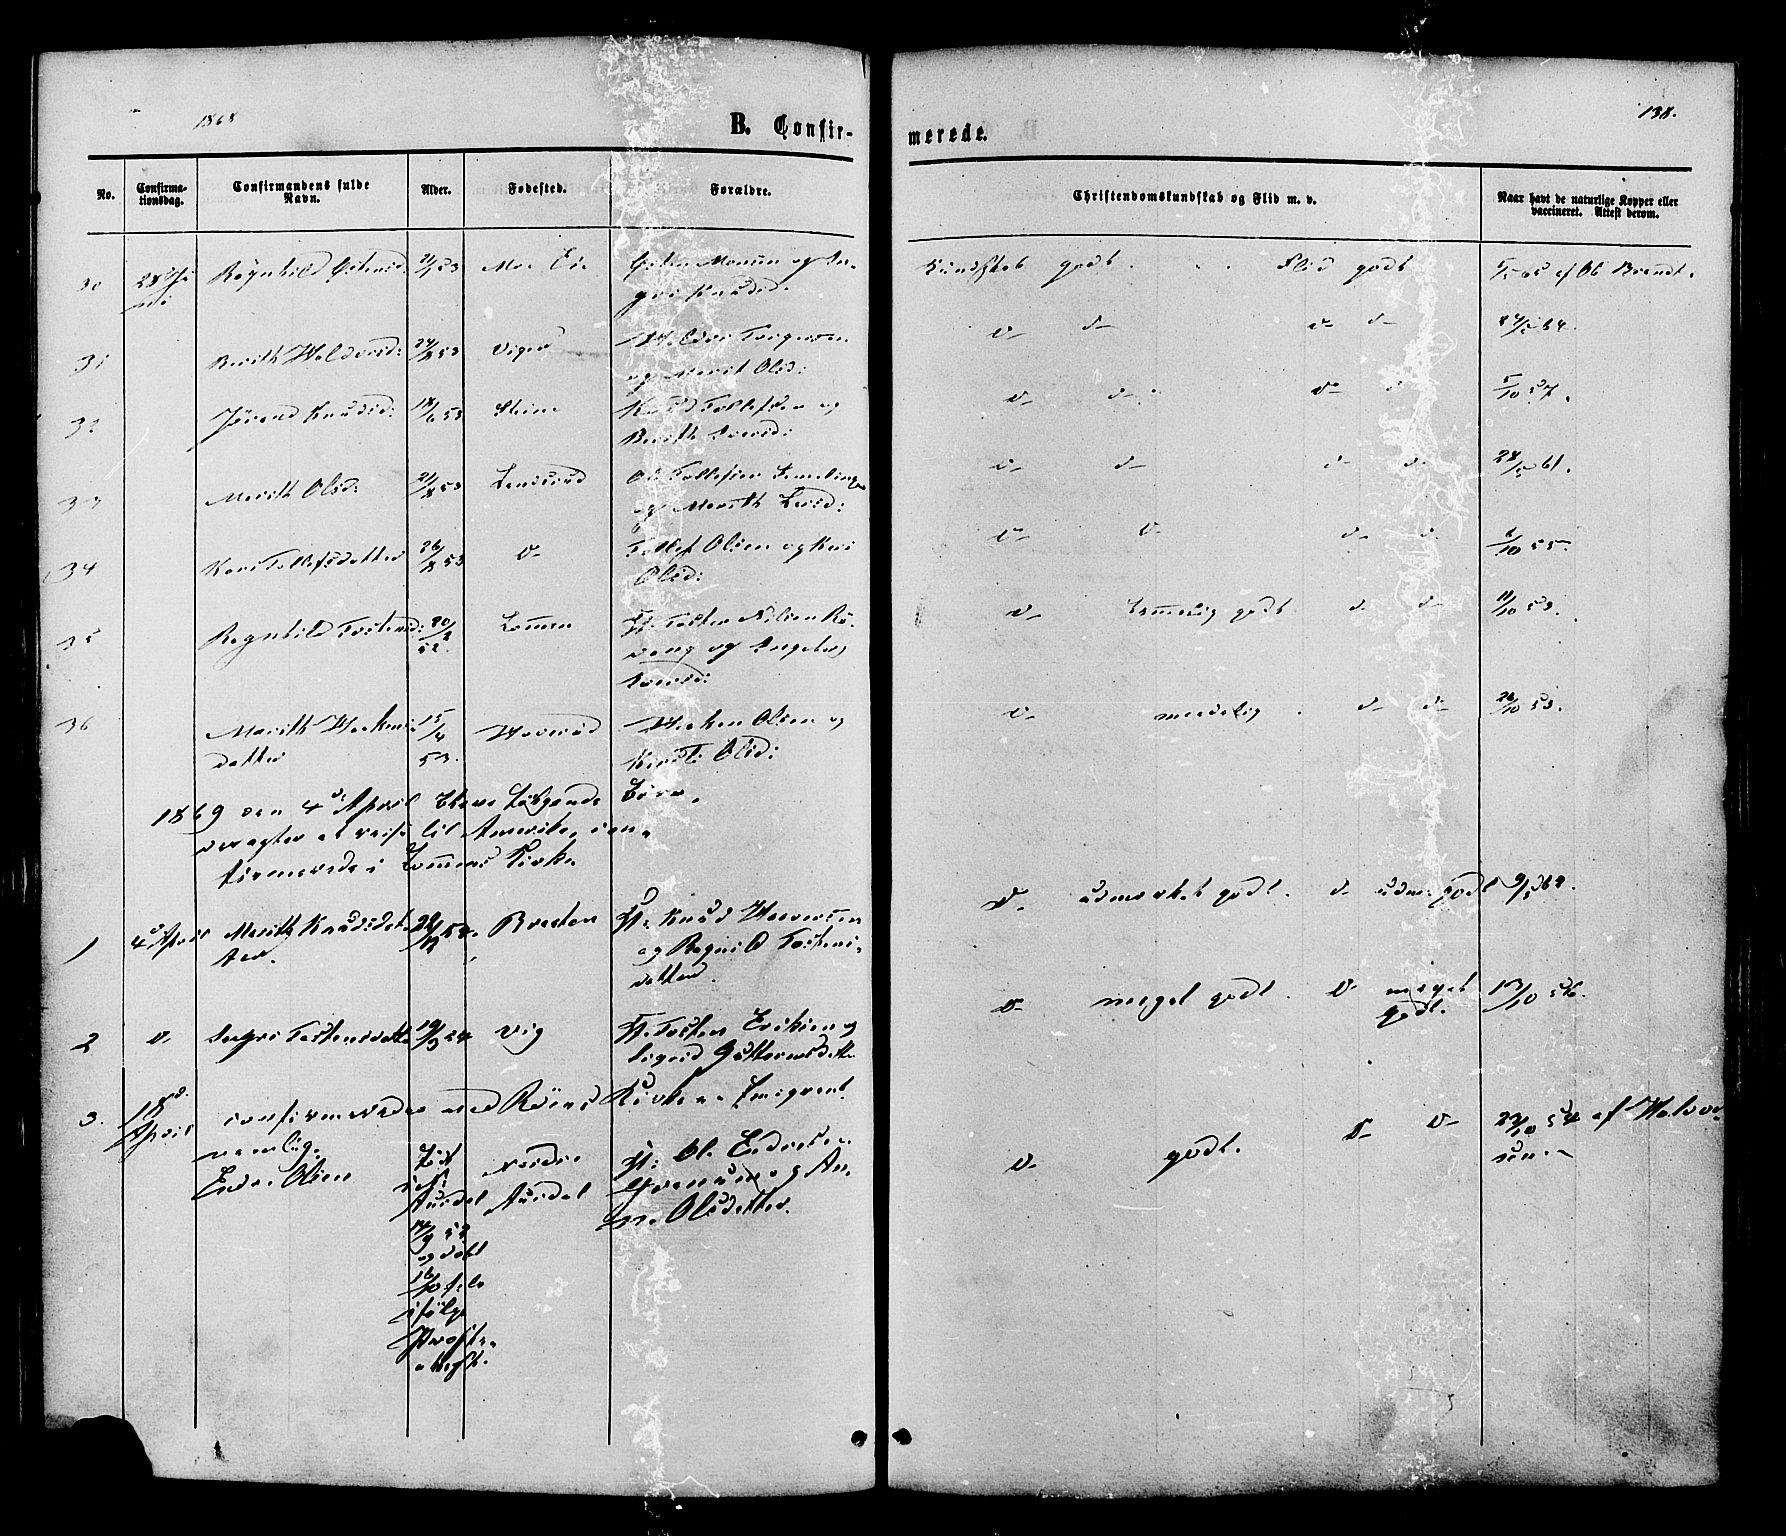 SAH, Vestre Slidre prestekontor, Ministerialbok nr. 3, 1865-1880, s. 138